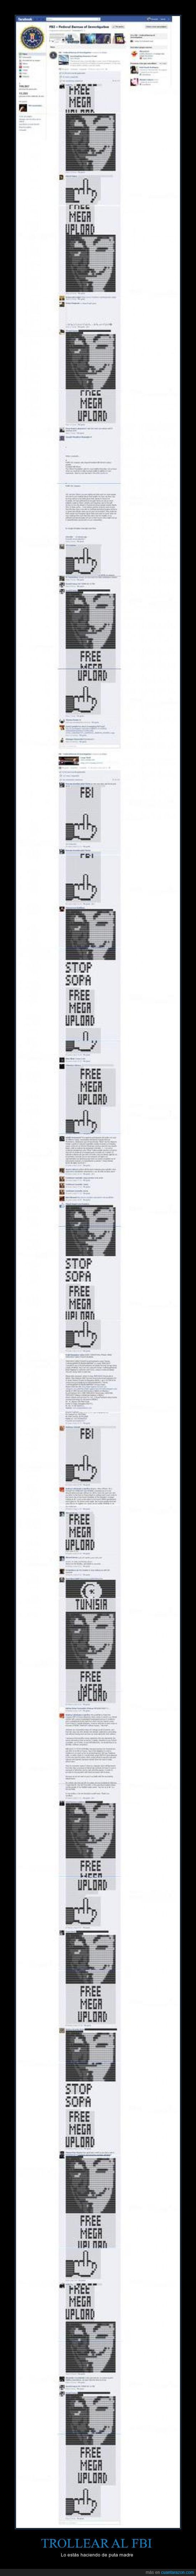 facebook,megaupload,muro,trolleo